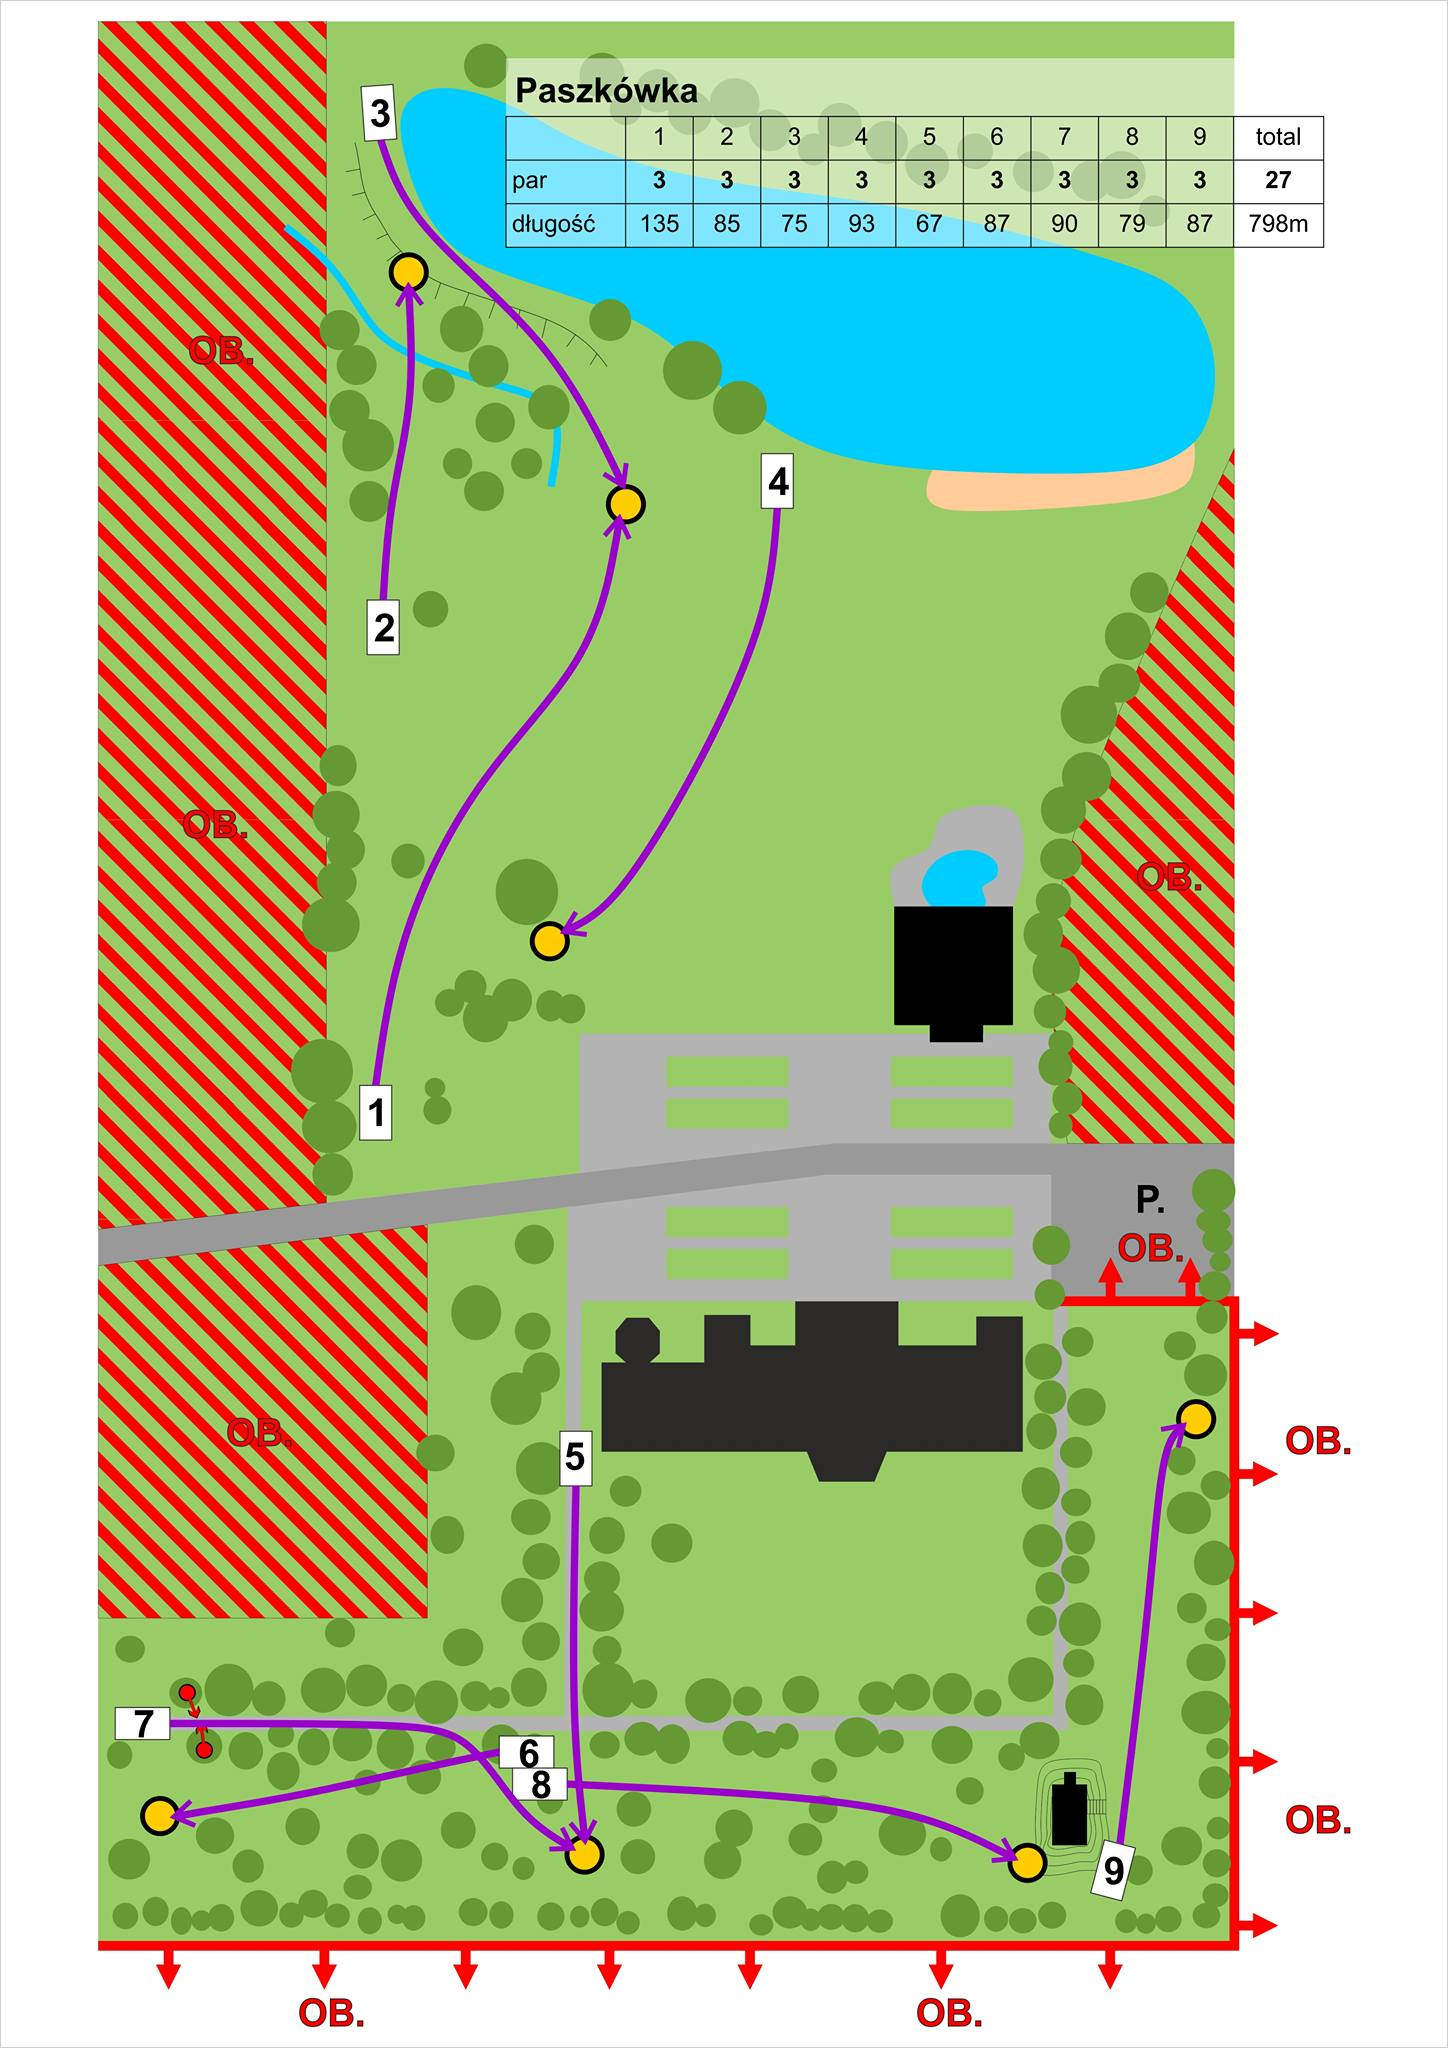 mapa_paszkowka